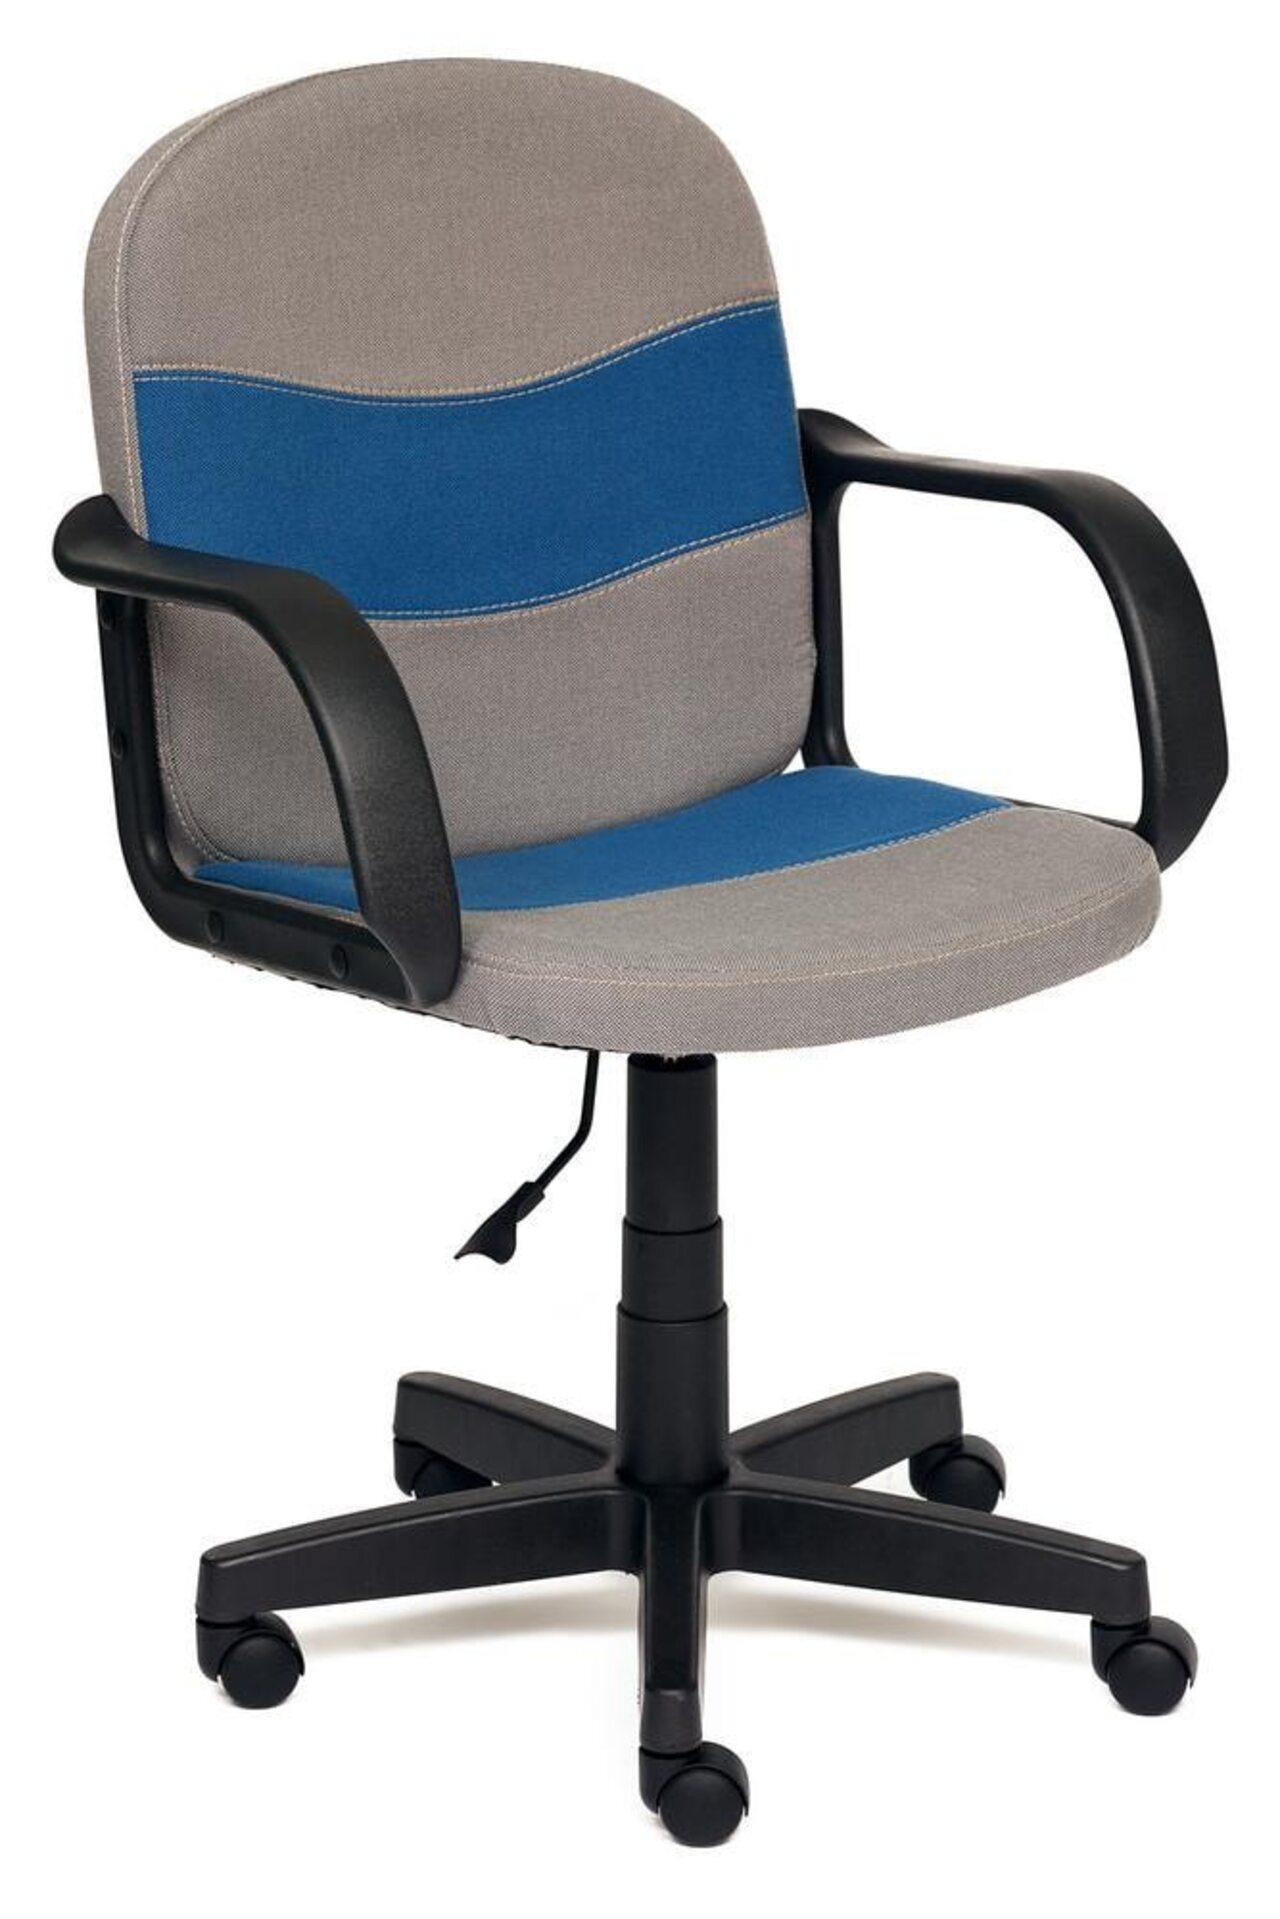 Кресло для персонала BAGGI (ткань) - фото 2